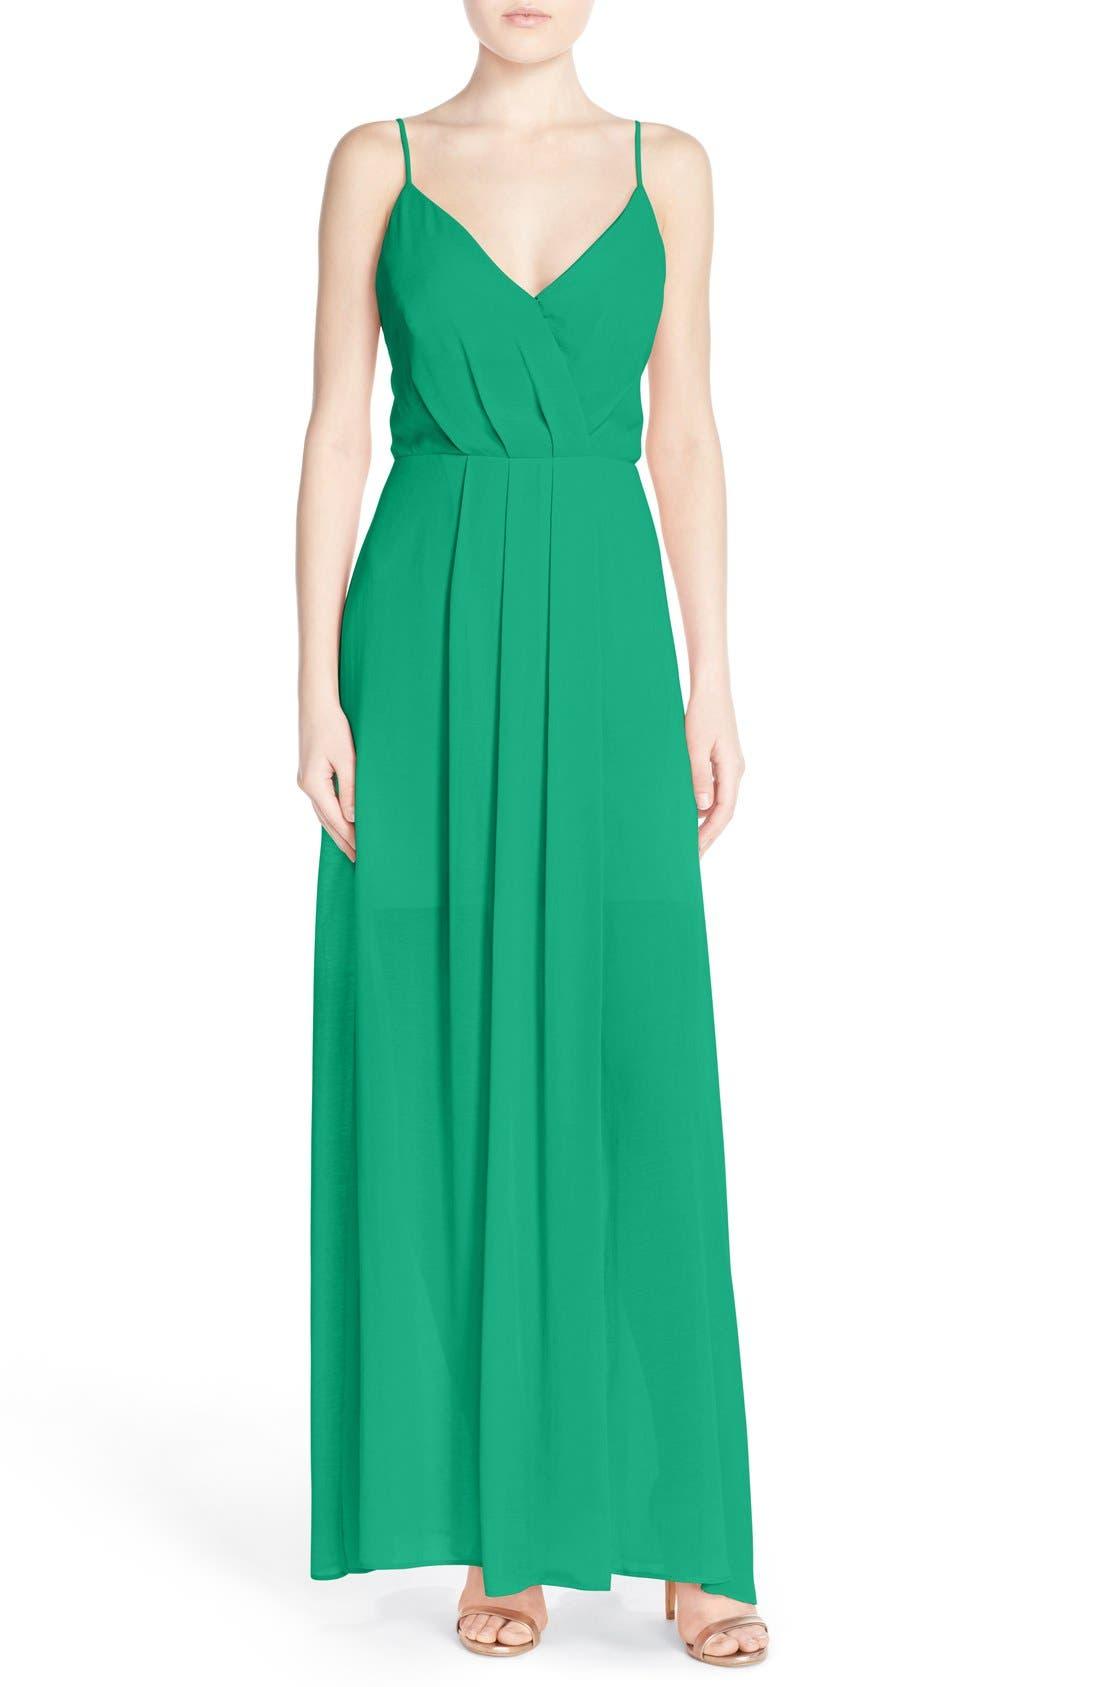 ADELYN RAE, Cutout Back Chiffon Maxi Dress, Main thumbnail 1, color, 340